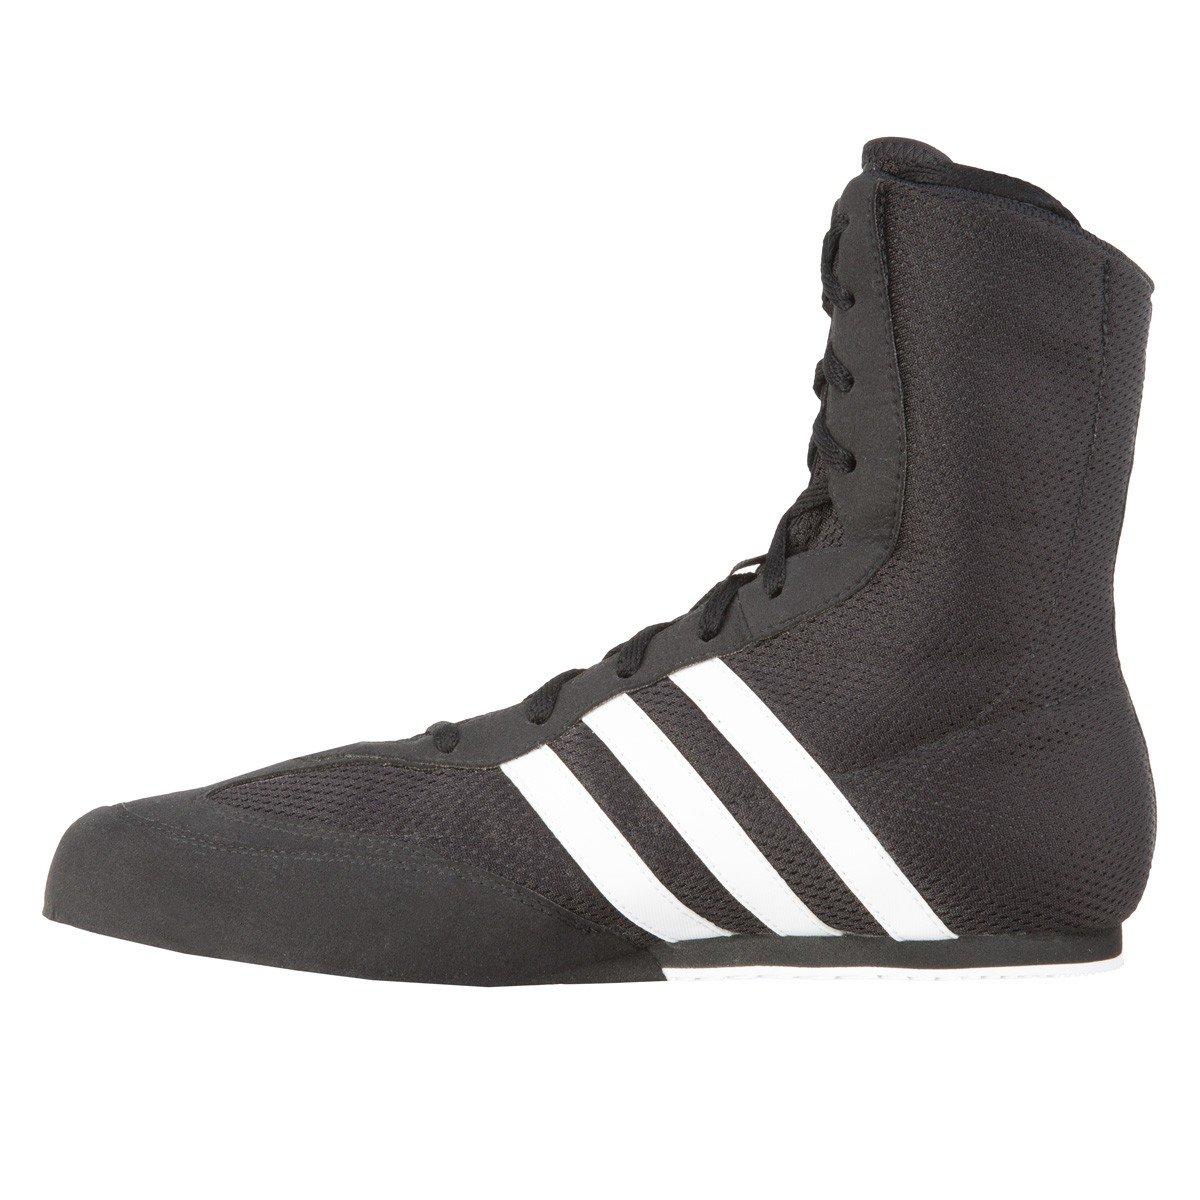 adidas Box Hog 2 Chaussures de Boxe Homme